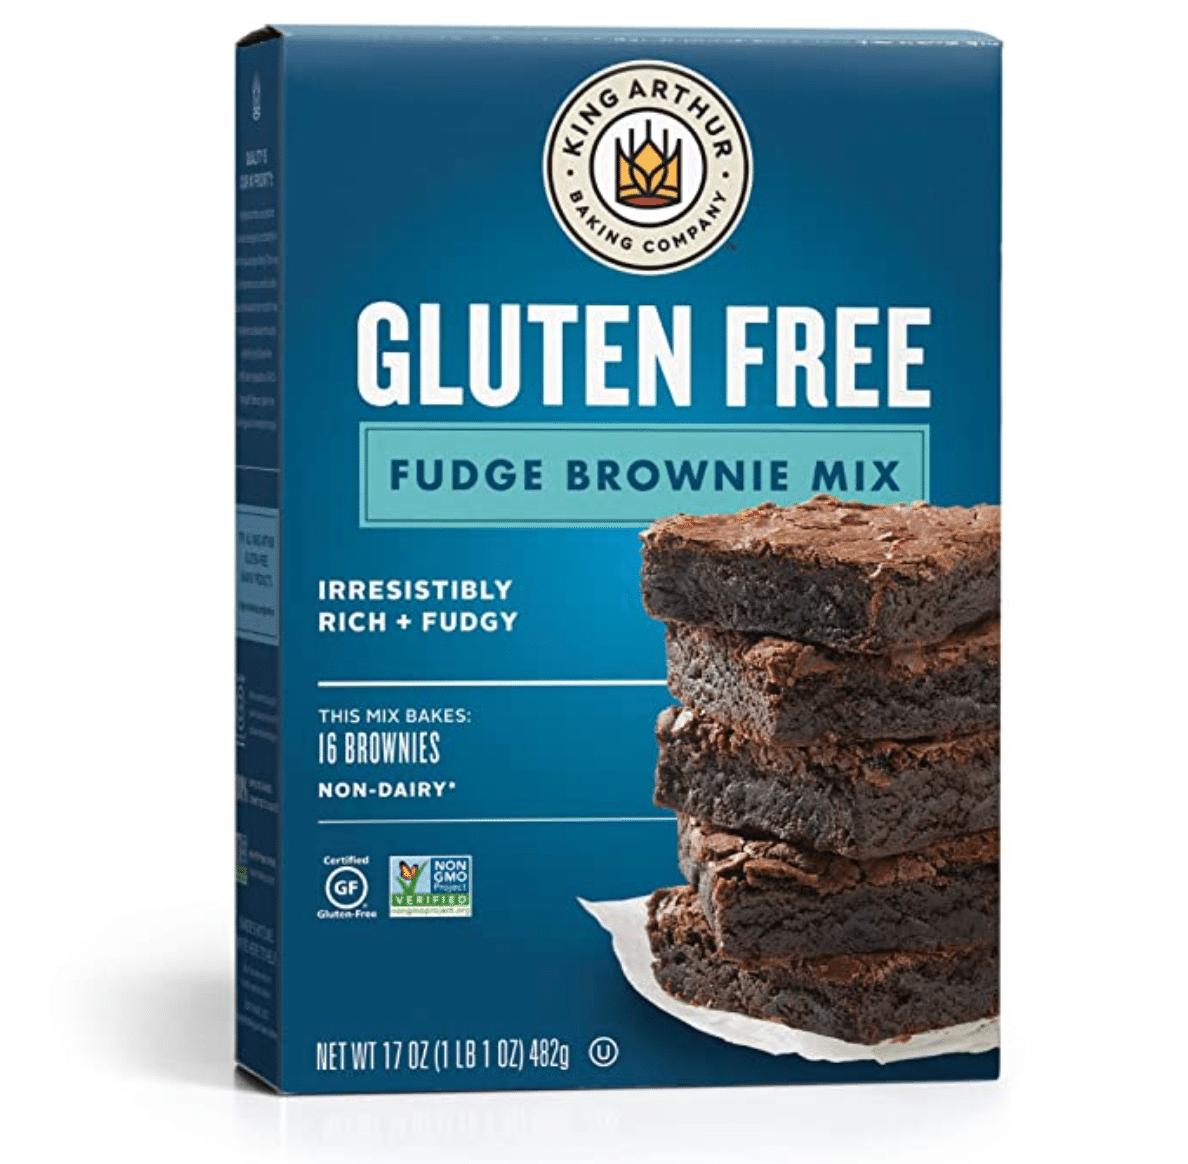 Gluten-Free Chocolate Fudge Brownie Mix